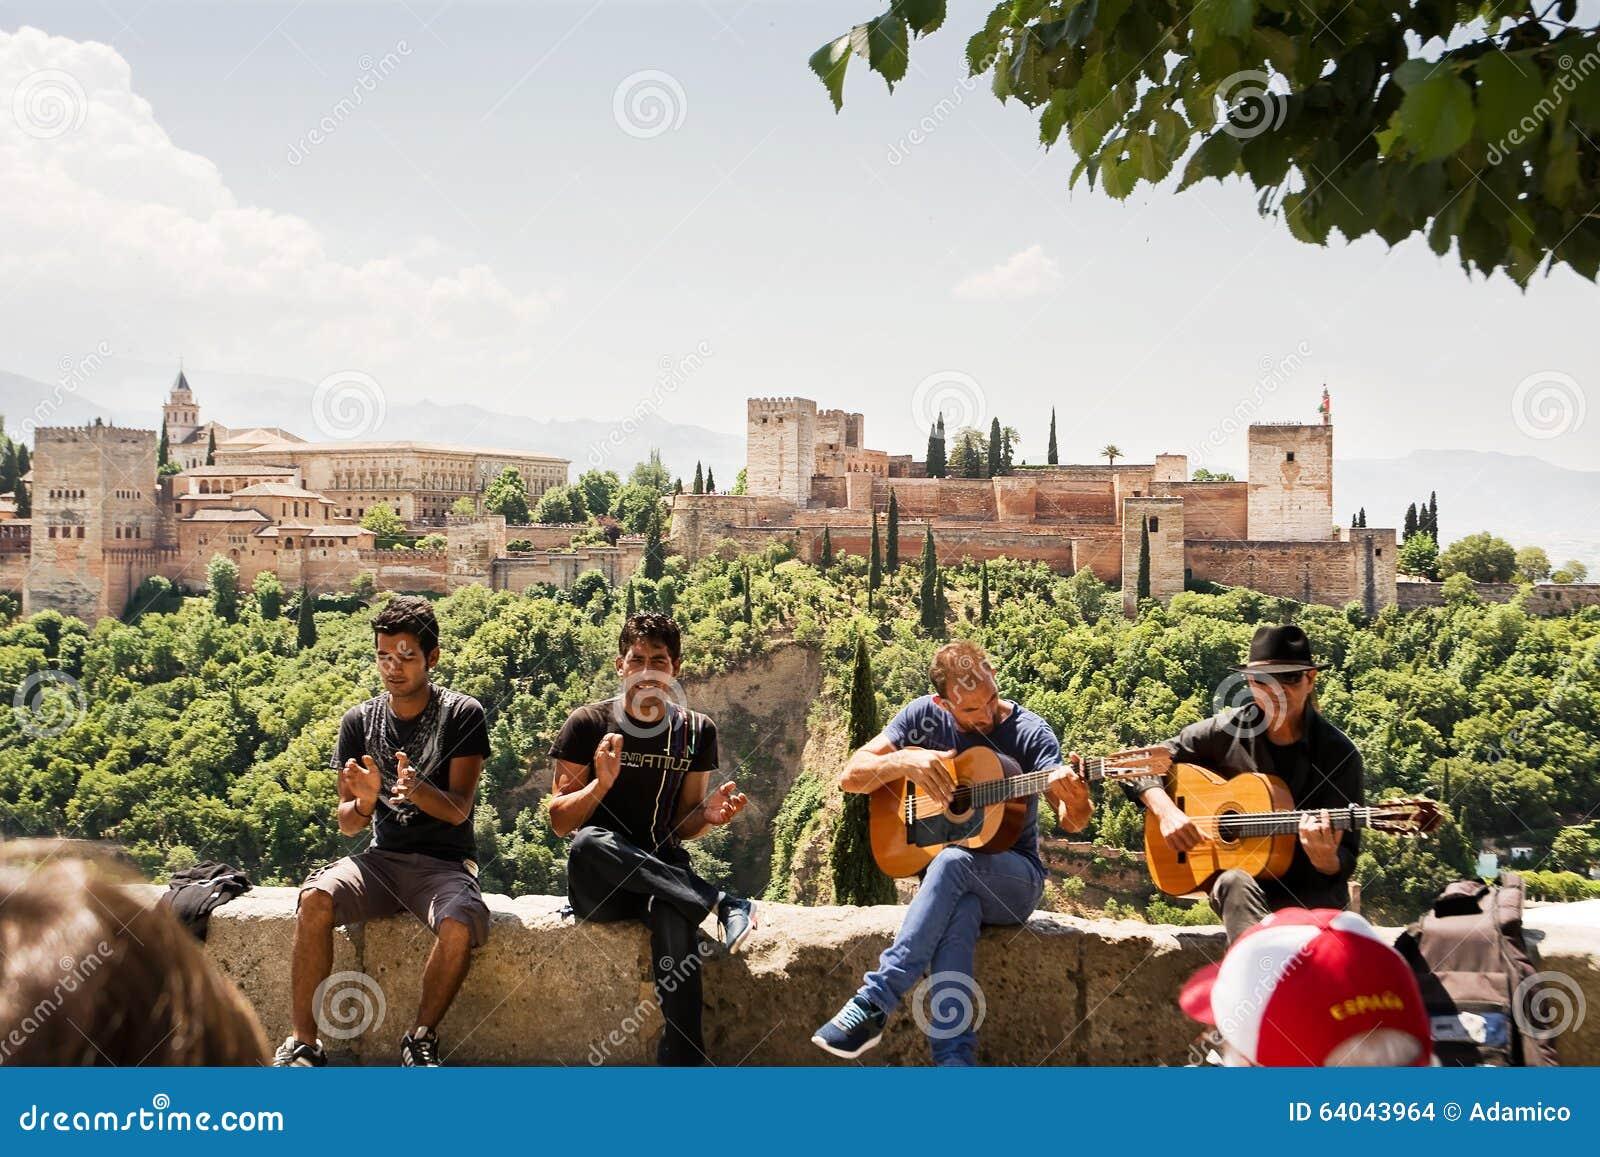 Alhambra Tour May